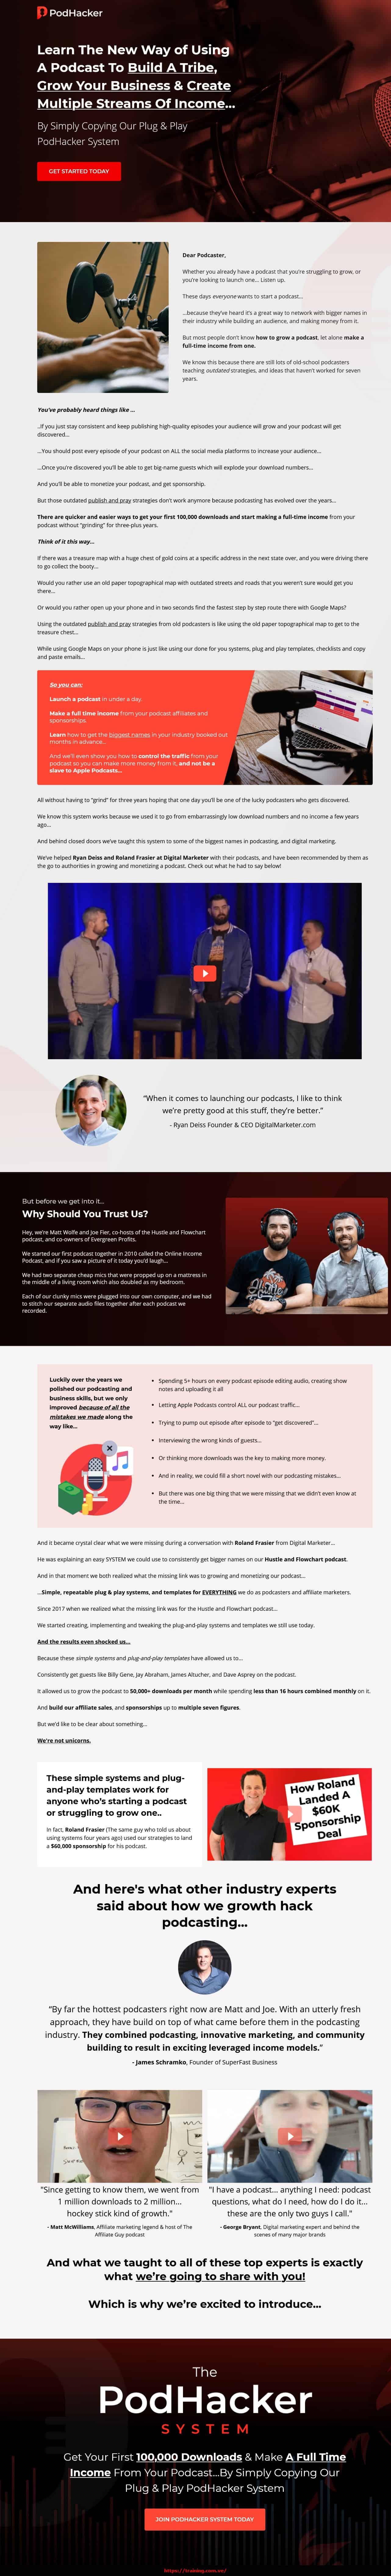 PodHacker by Matt Wolfe sales page